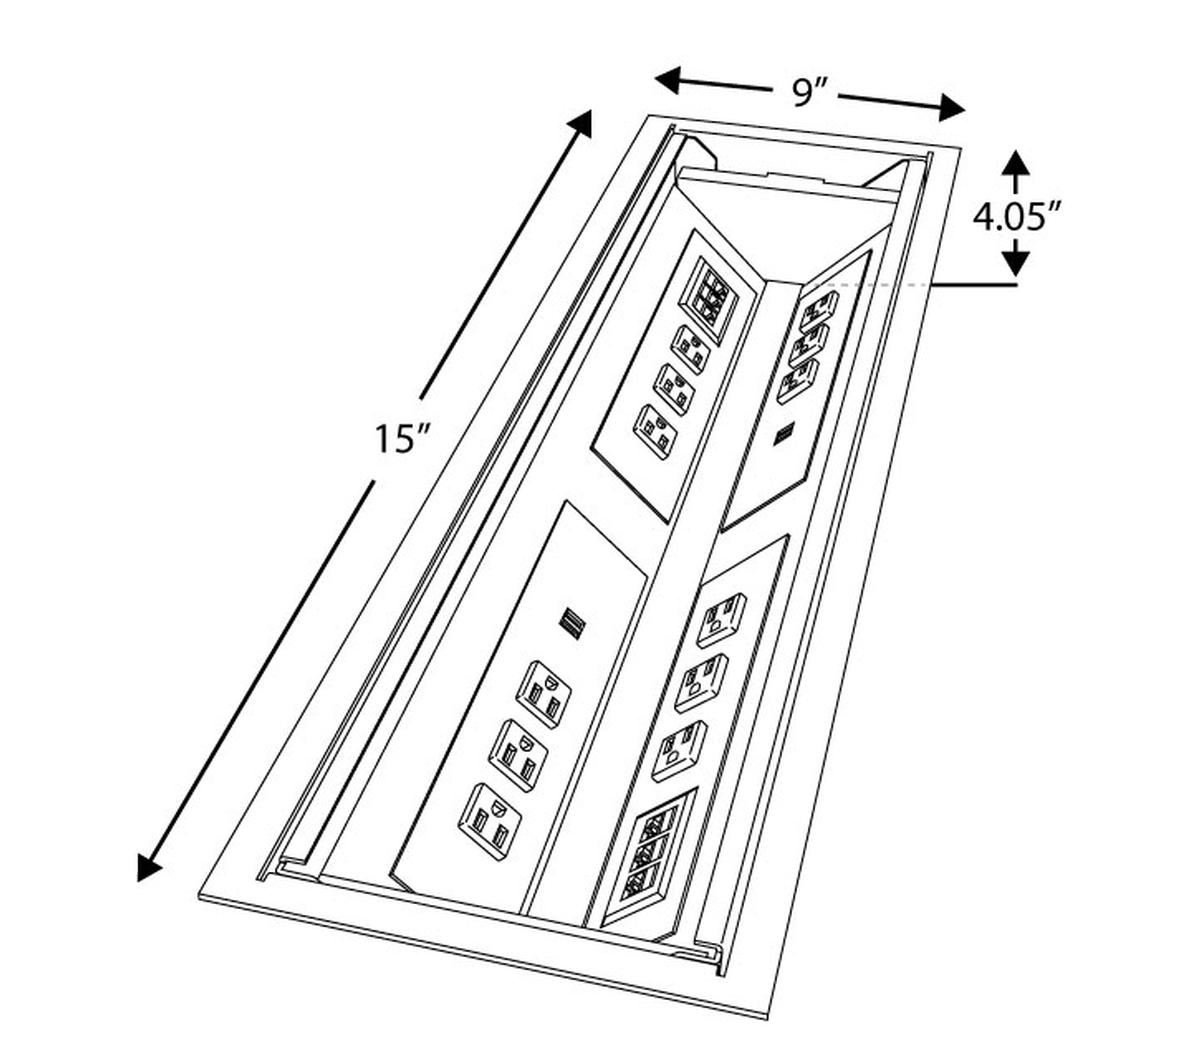 Eca Oasis 30 Table Well Box W Dual Slide Away Lids 12